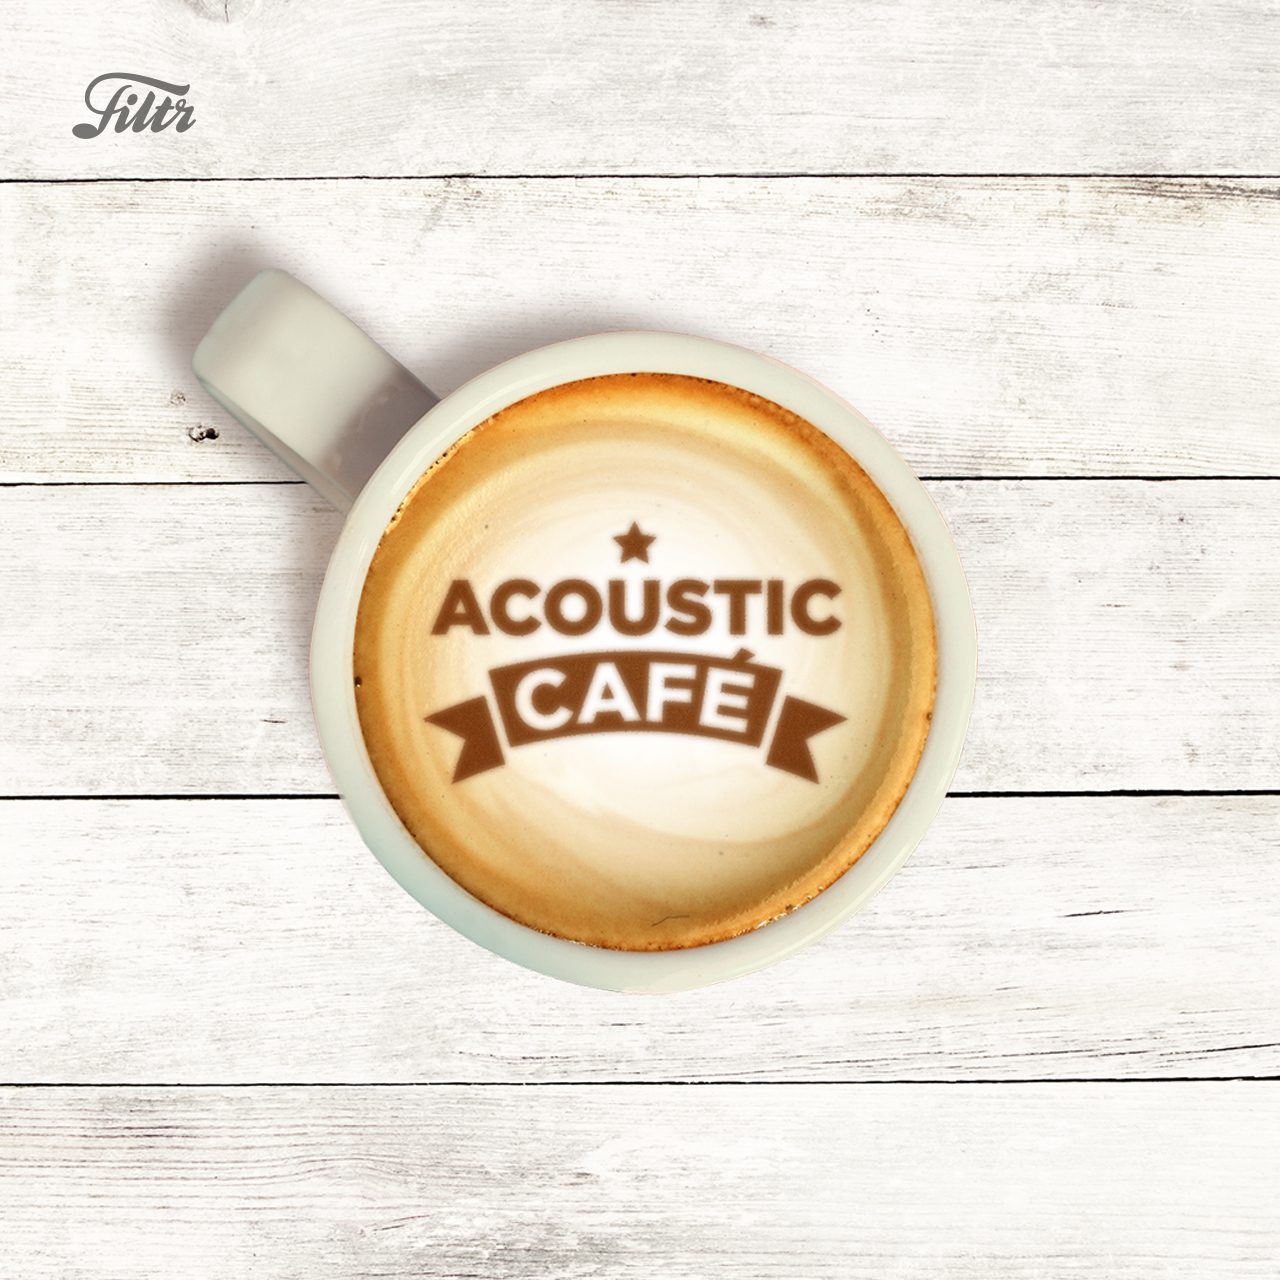 Acoustic-Cafe.jpg